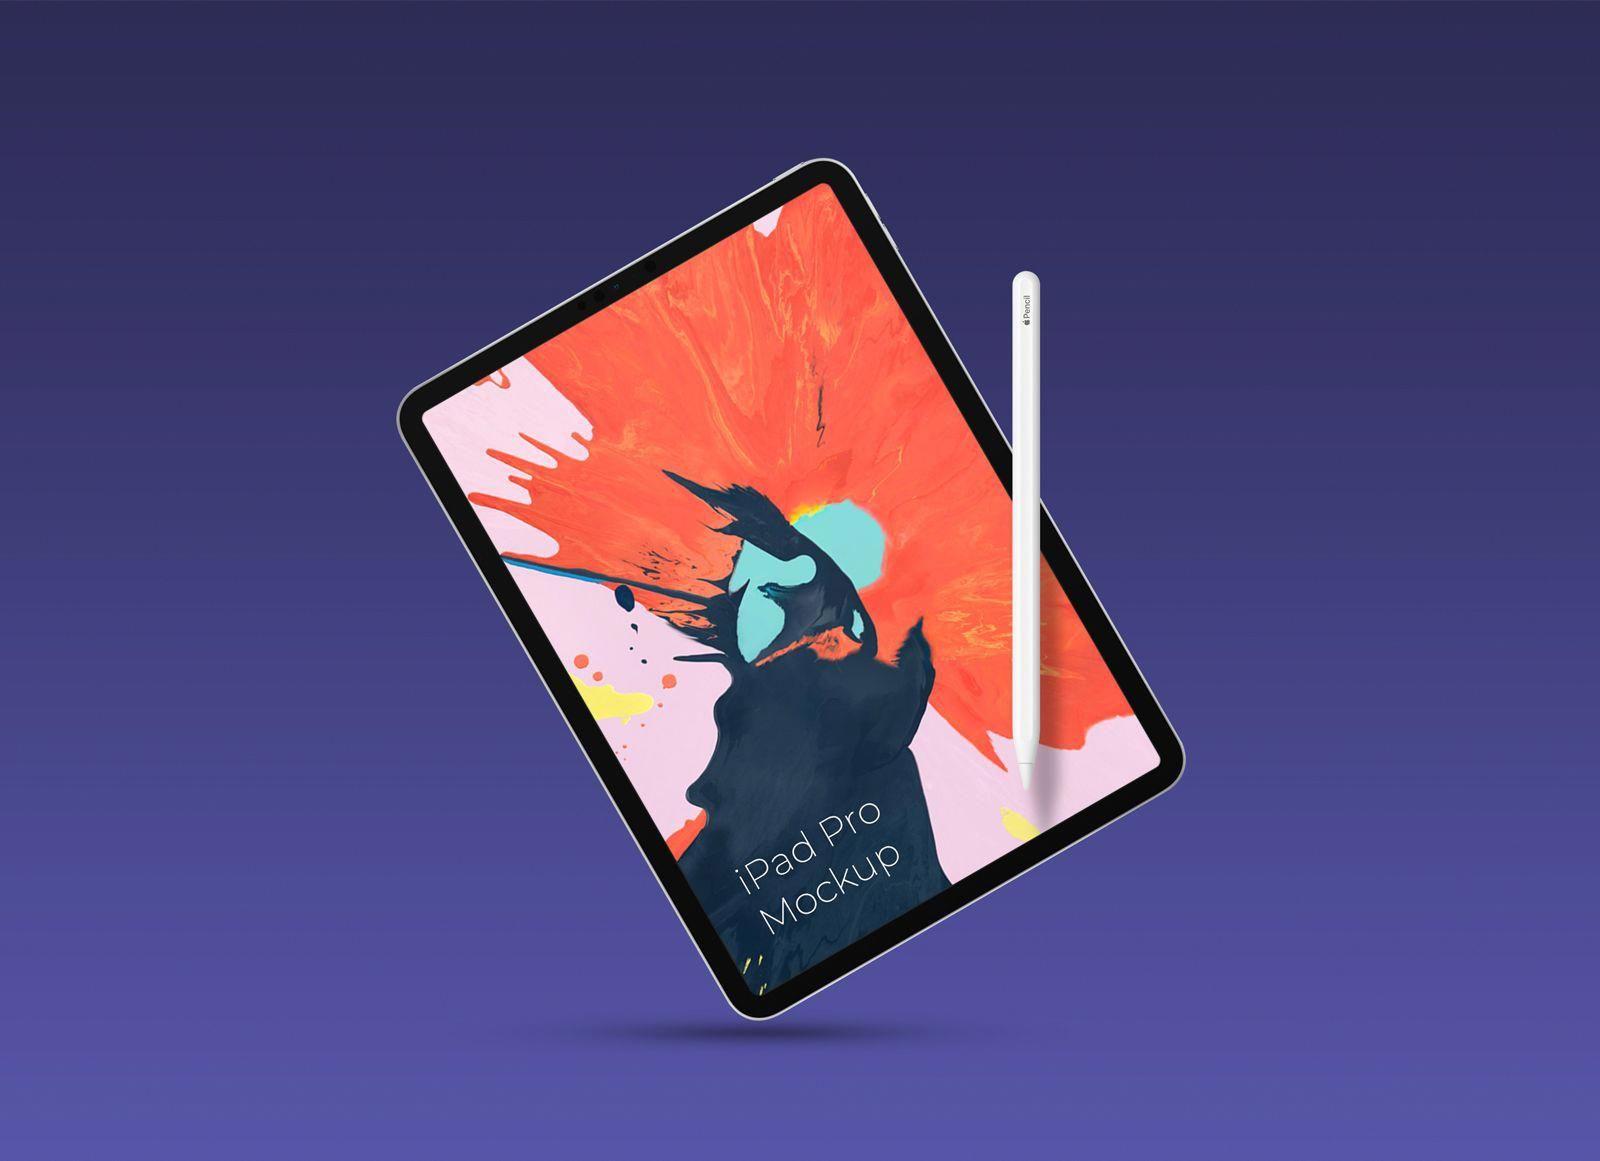 Free Ipad Pro 2018 With Pencil Mockup Psd Ipadpro Ipad Pro Ipad Free Ipad